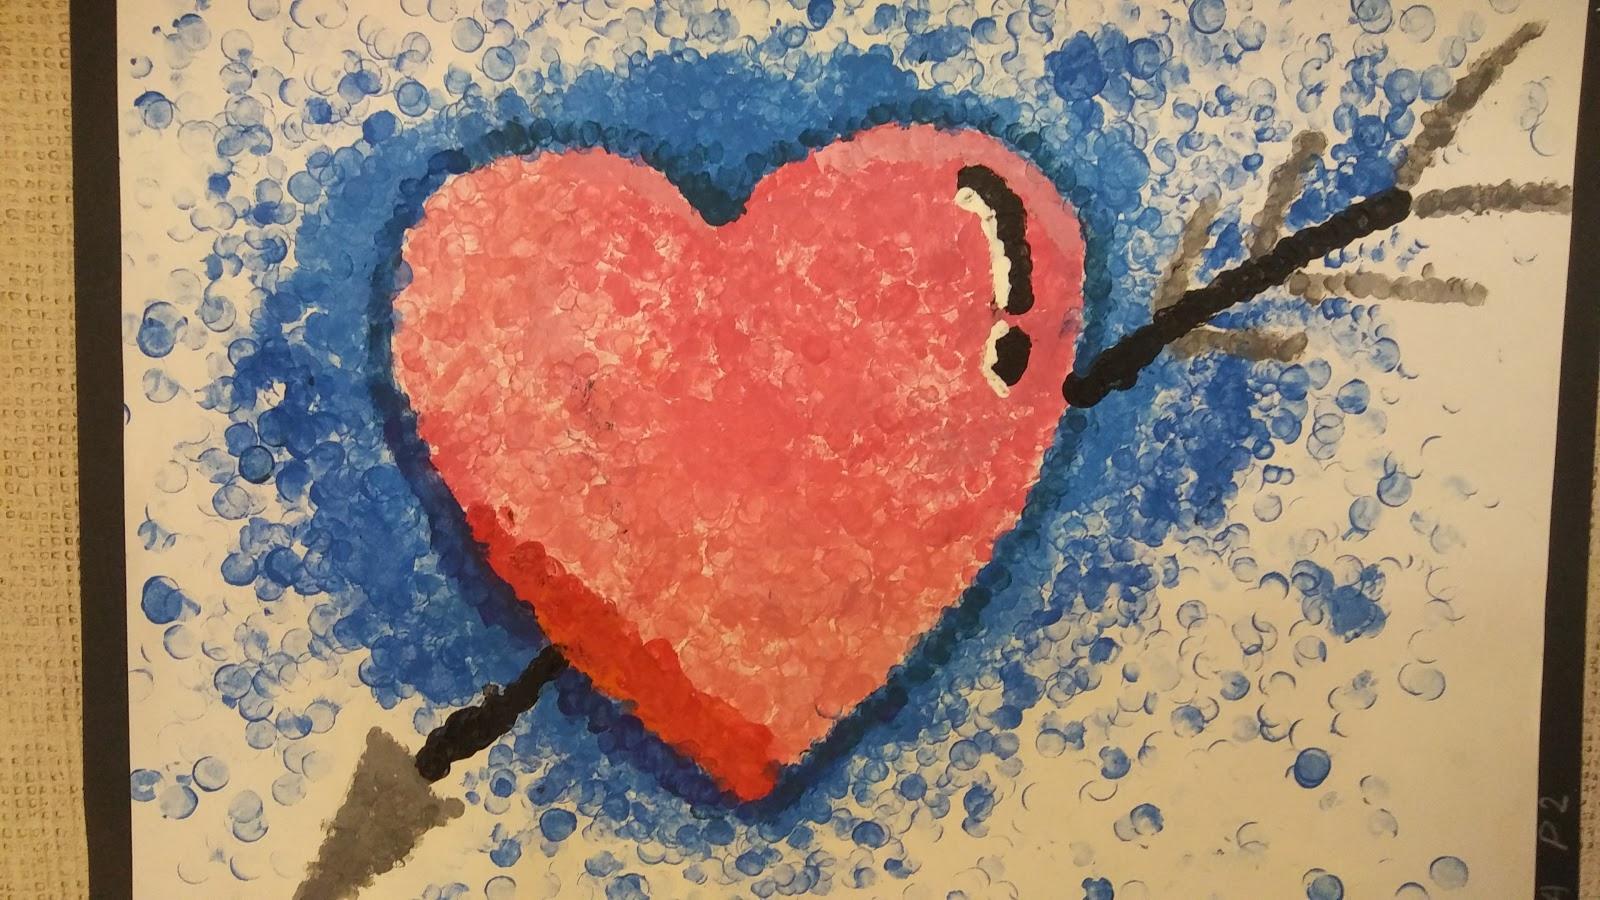 Landmark Student Painting of Heart